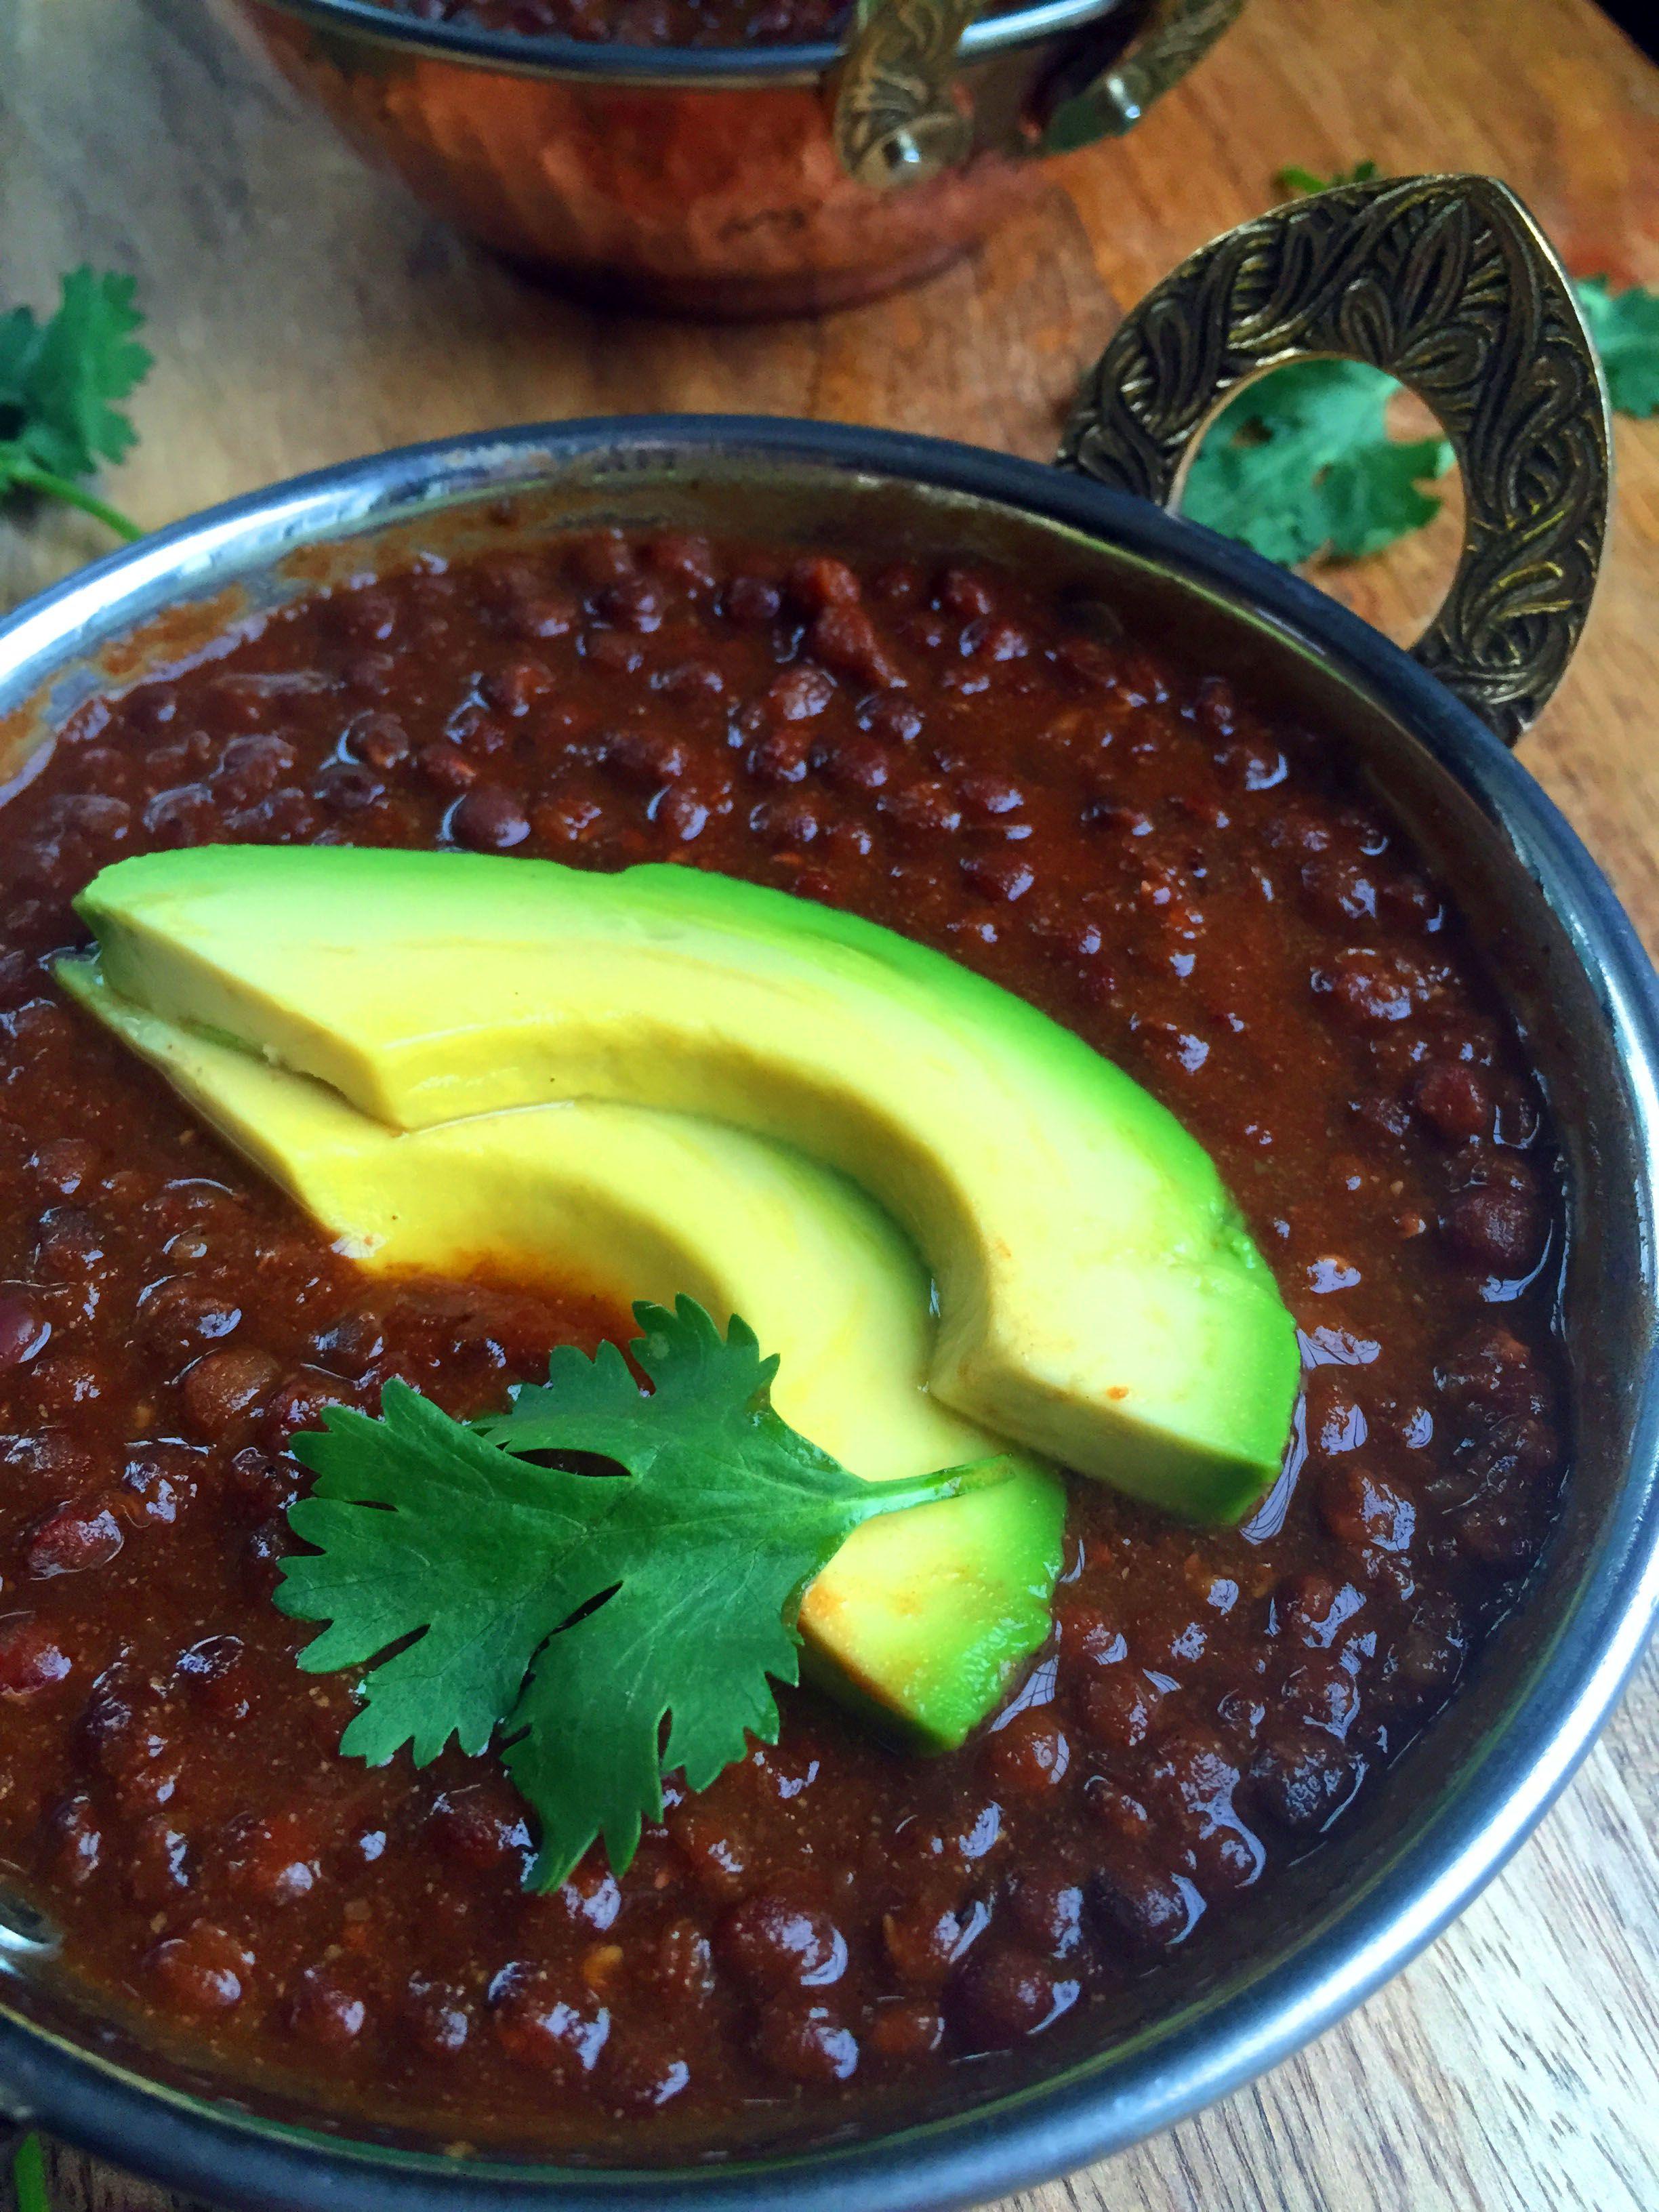 Spicy Vegan Dal Makhani Beluga Or Black Lentils For The Slow Cooker Indian Beans Recipe Recipes Beluga Lentils Recipe